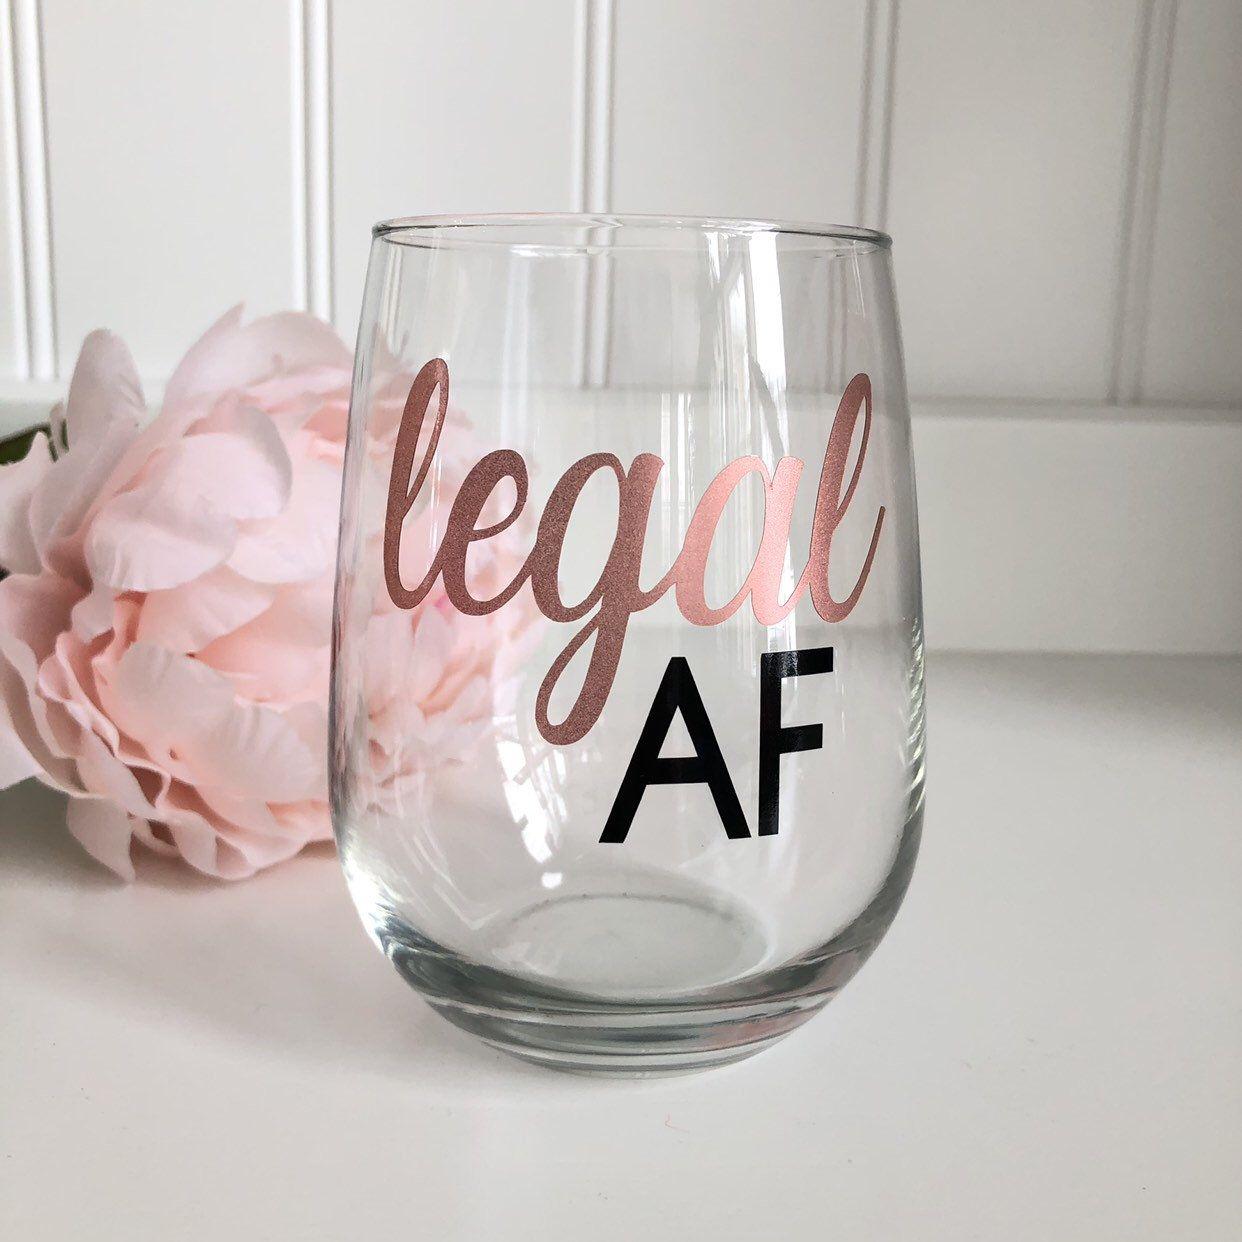 Legal Af 21st Birthday Wine Glass Finally Legal 21st Birthday